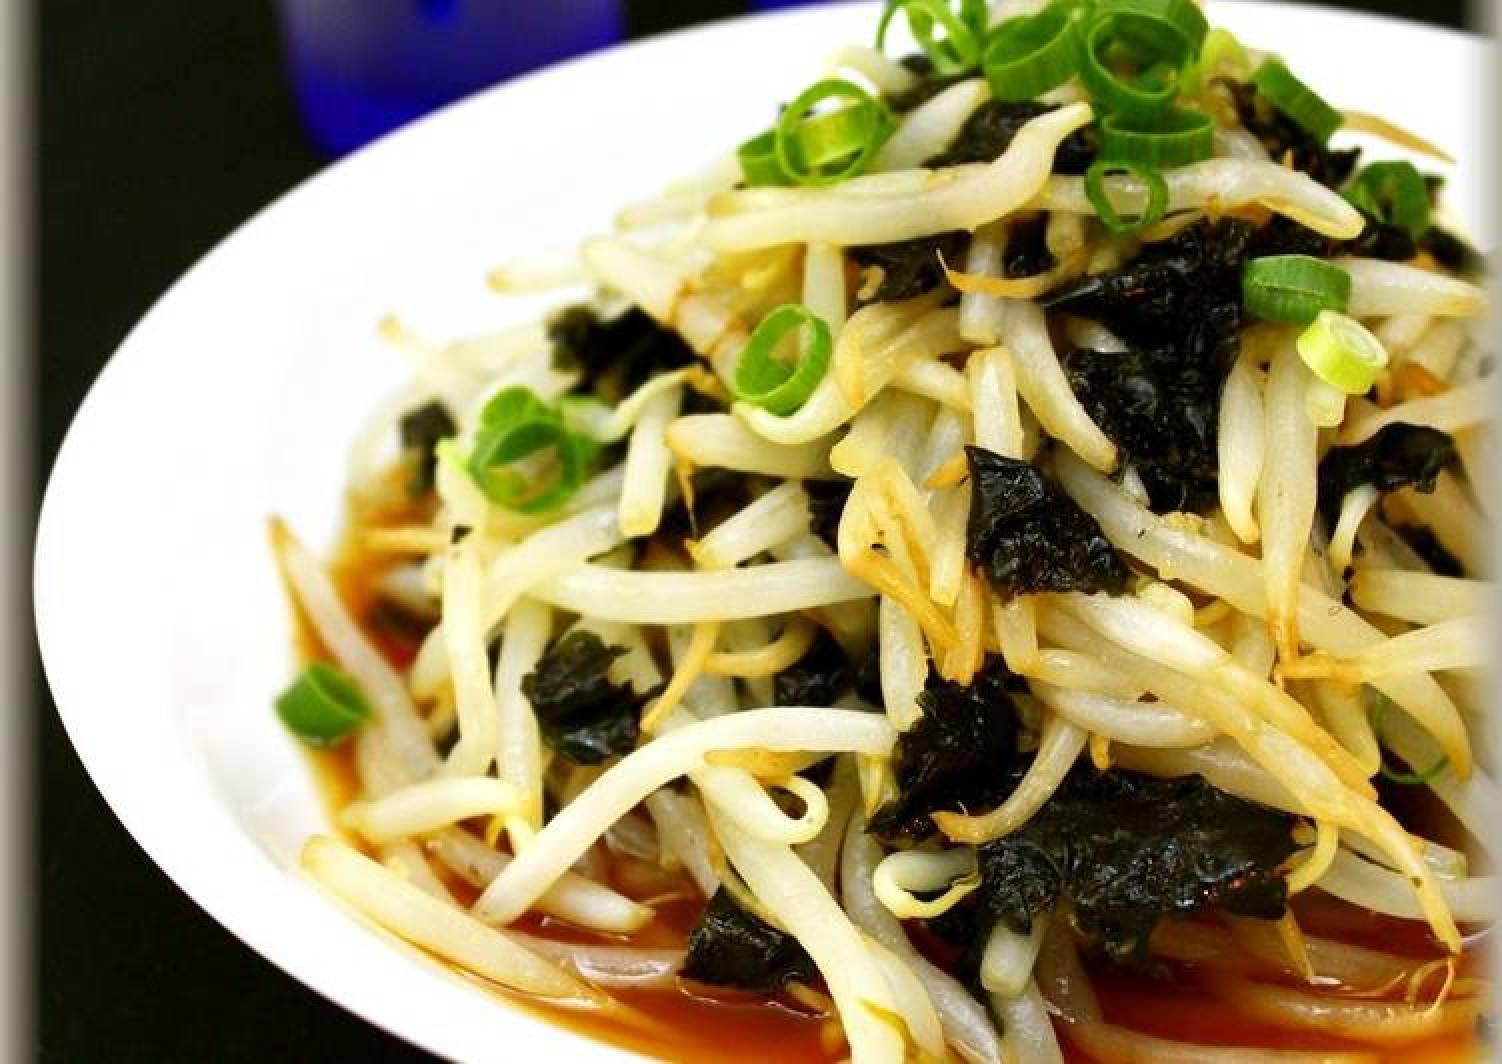 Bean Sprouts and Nori Seaweed Salad With Sweet Vinegar Garlic Sauce